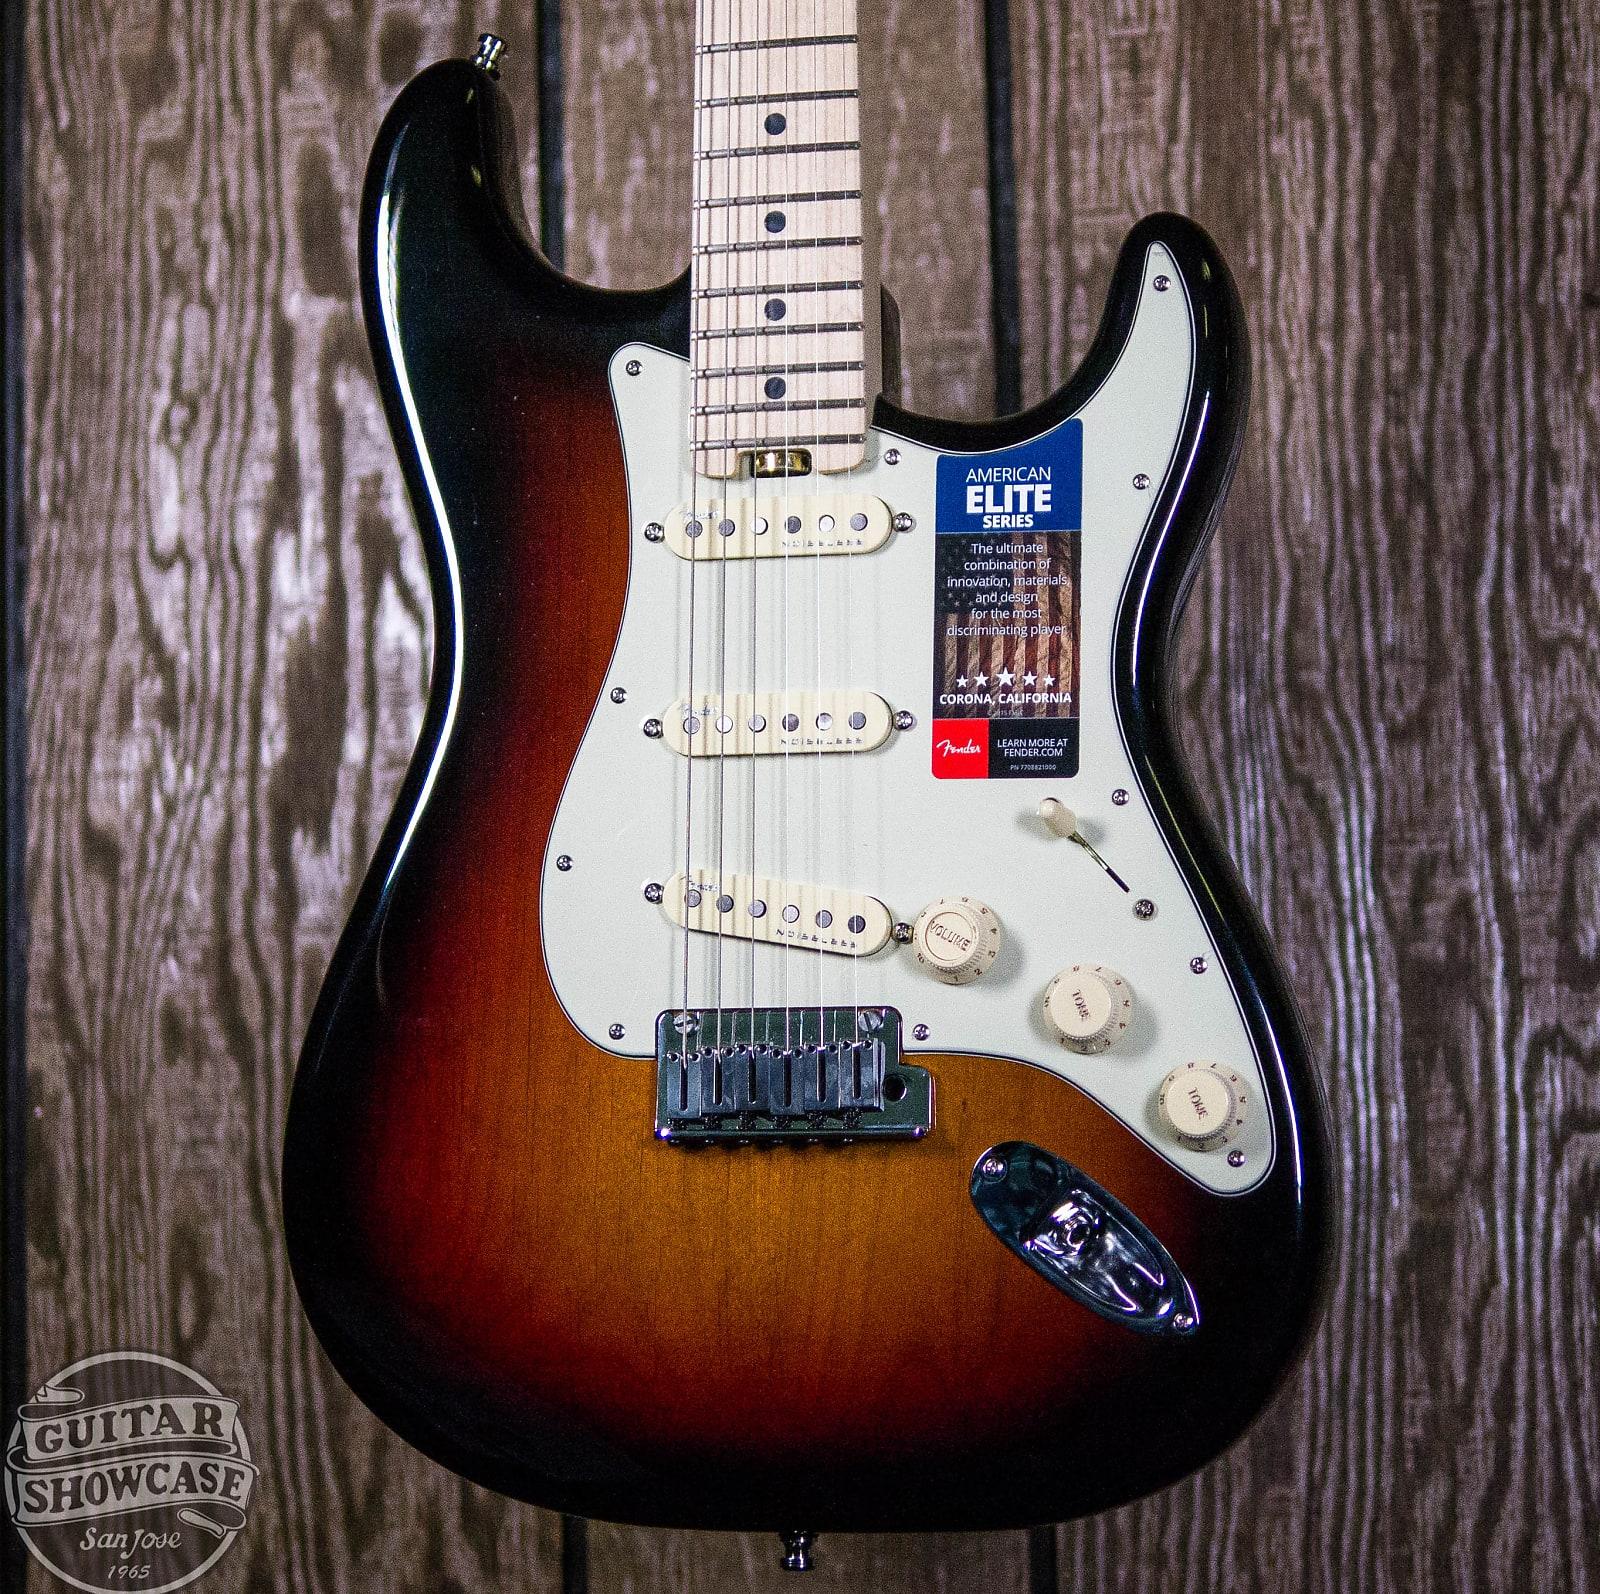 Fender American Elite Stratocaster Neck Maple Fingerboard